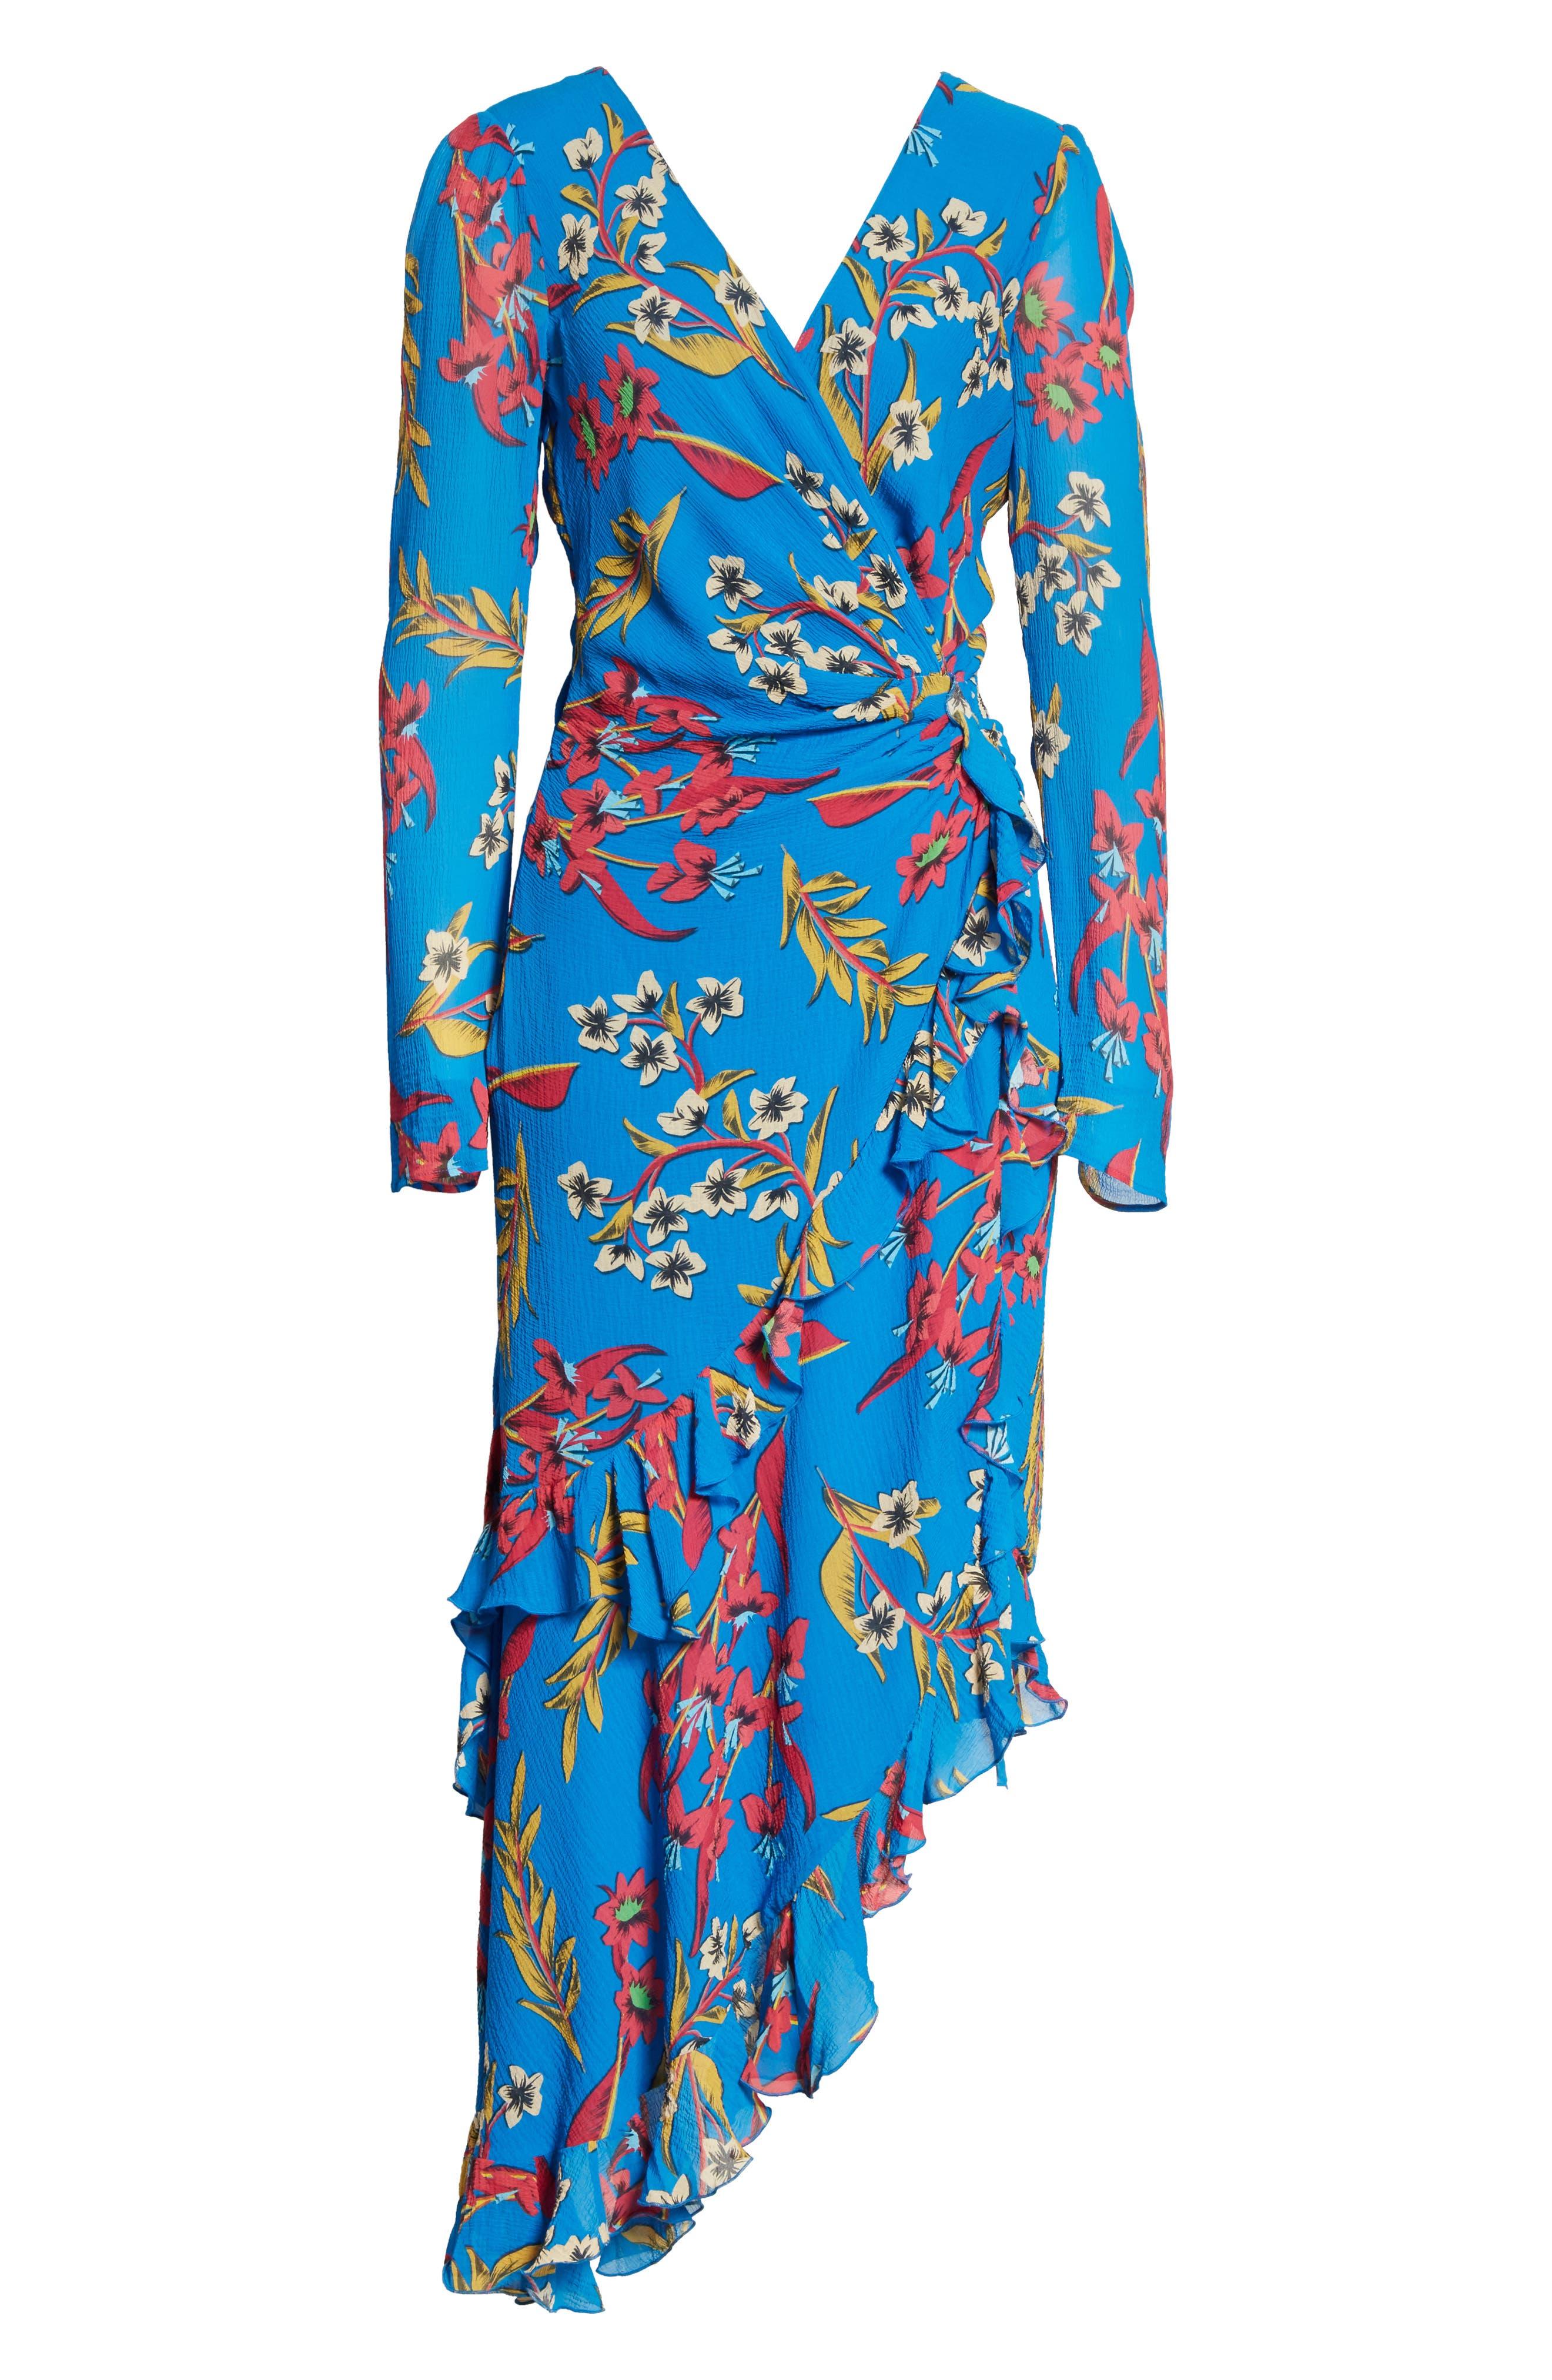 Jungle Floral Print Asymmetrical Ruffle Dress,                             Alternate thumbnail 6, color,                             410